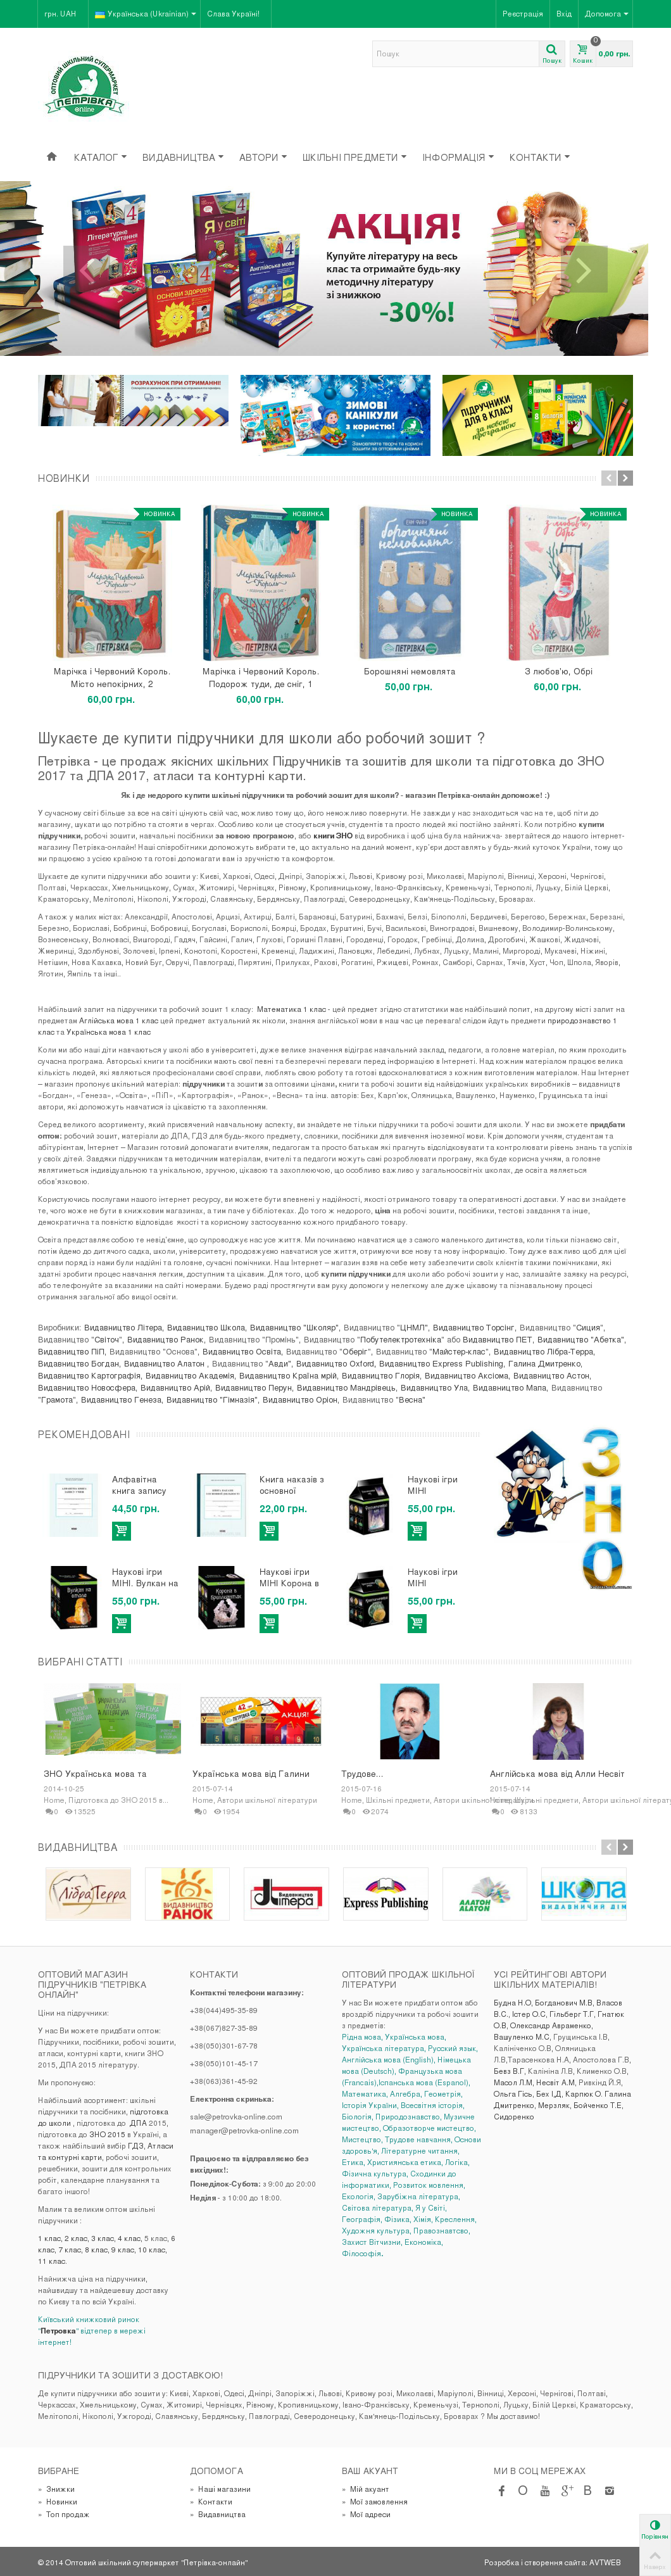 Ugledar: a selection of sites